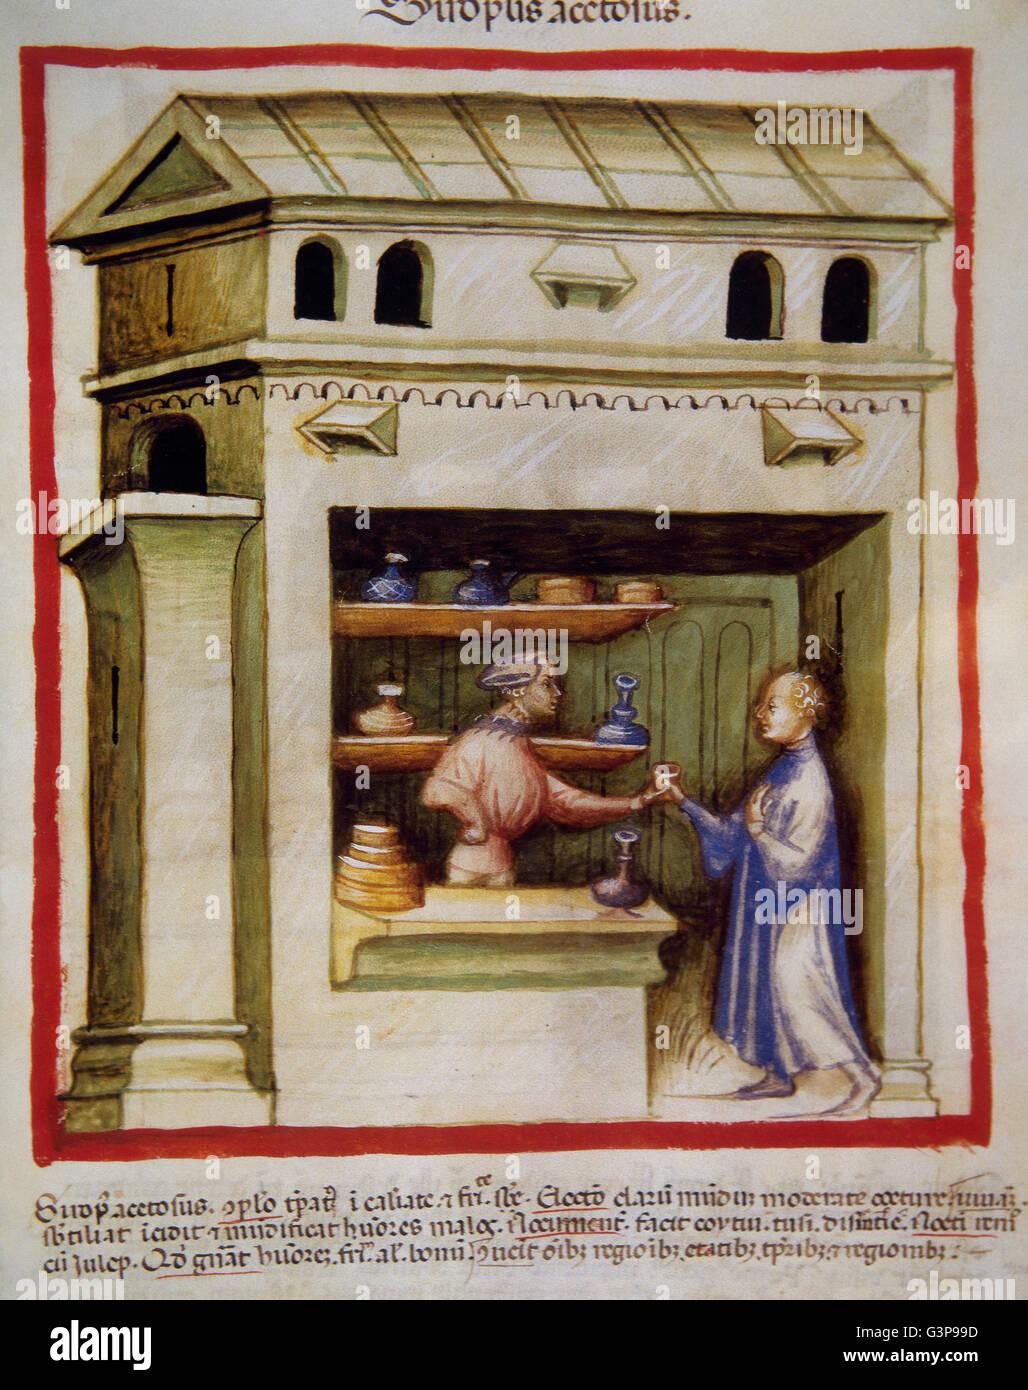 Tacuinum Sanitatis. 14th century. Medieval handbook of health. An apothecary gives vinegar syrup to a man. Folio Stock Photo